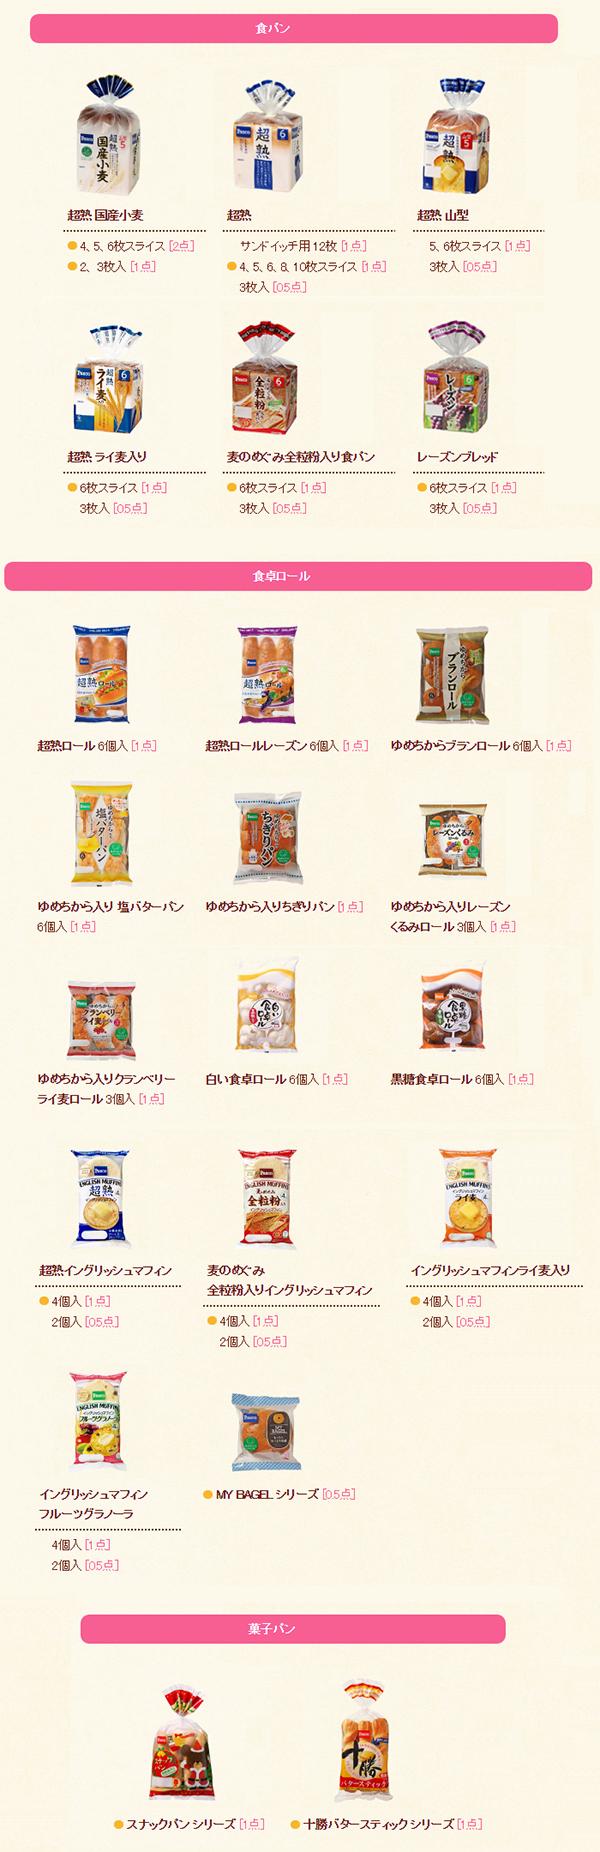 Pasco キャンペーン対象商品